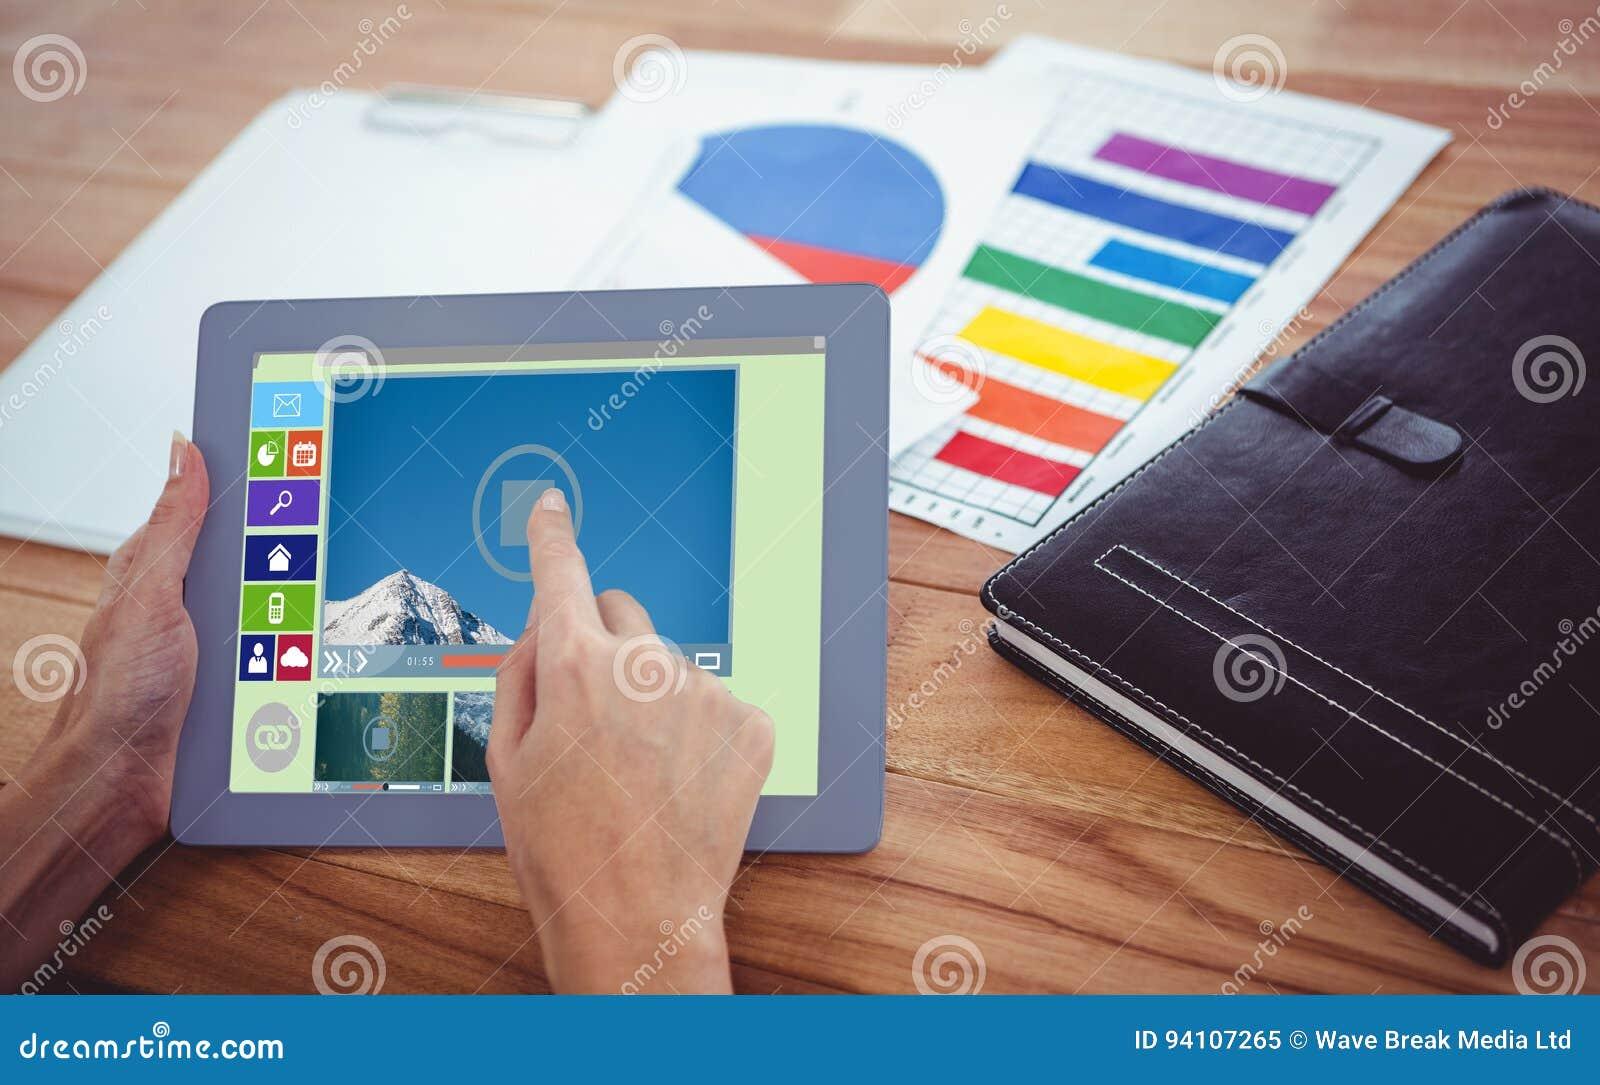 Adult desktop icons